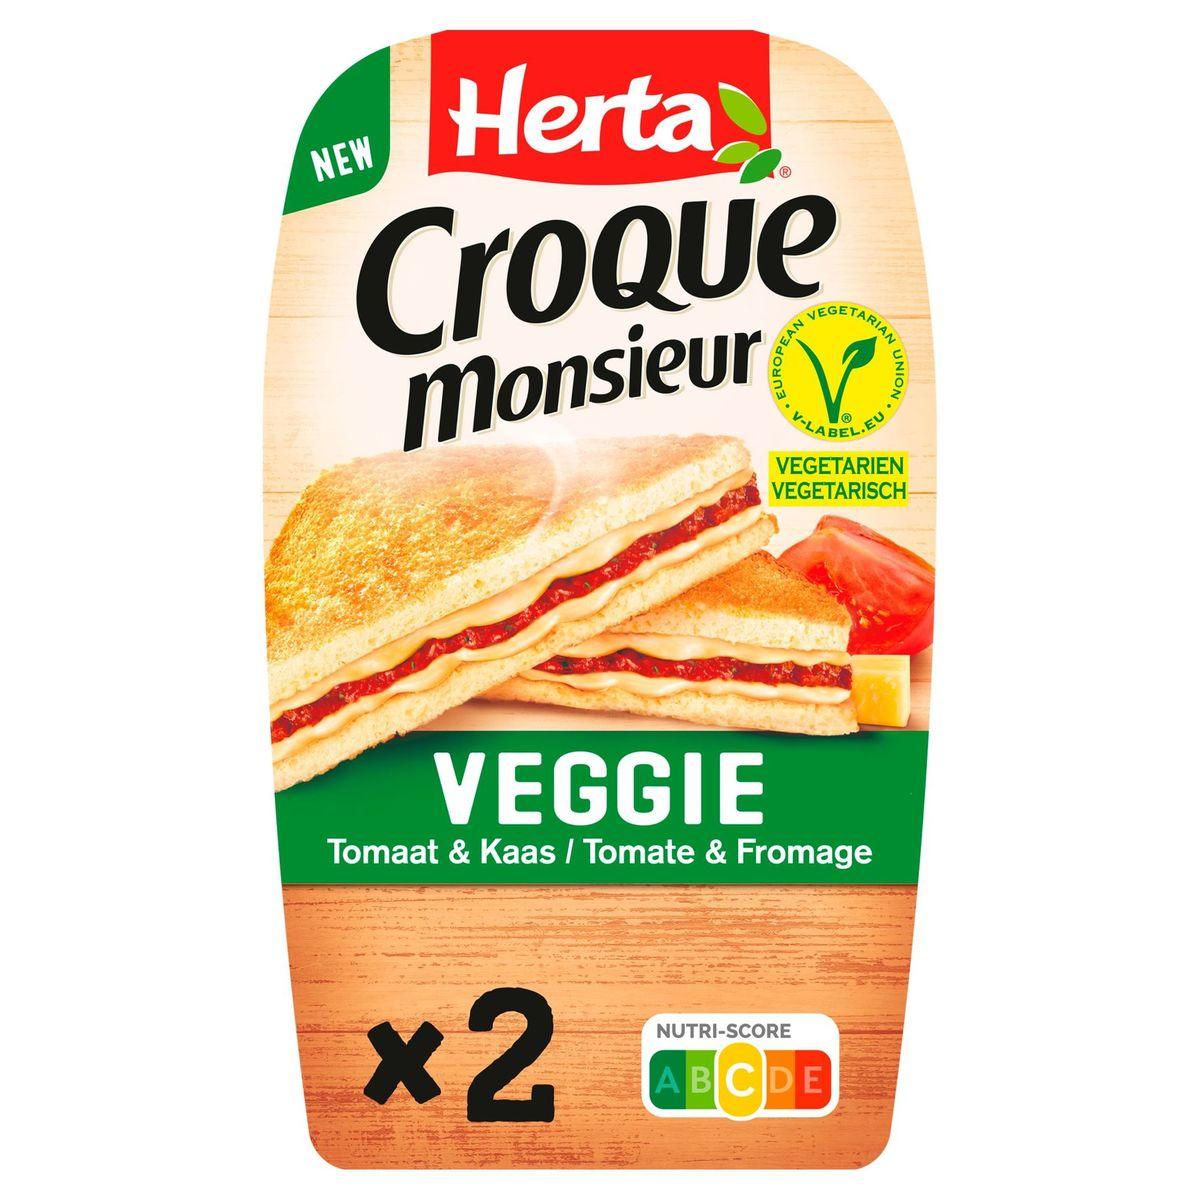 Herta Croque Monsieur Veggie Tomate & Fromage 2 Pièces 200 g